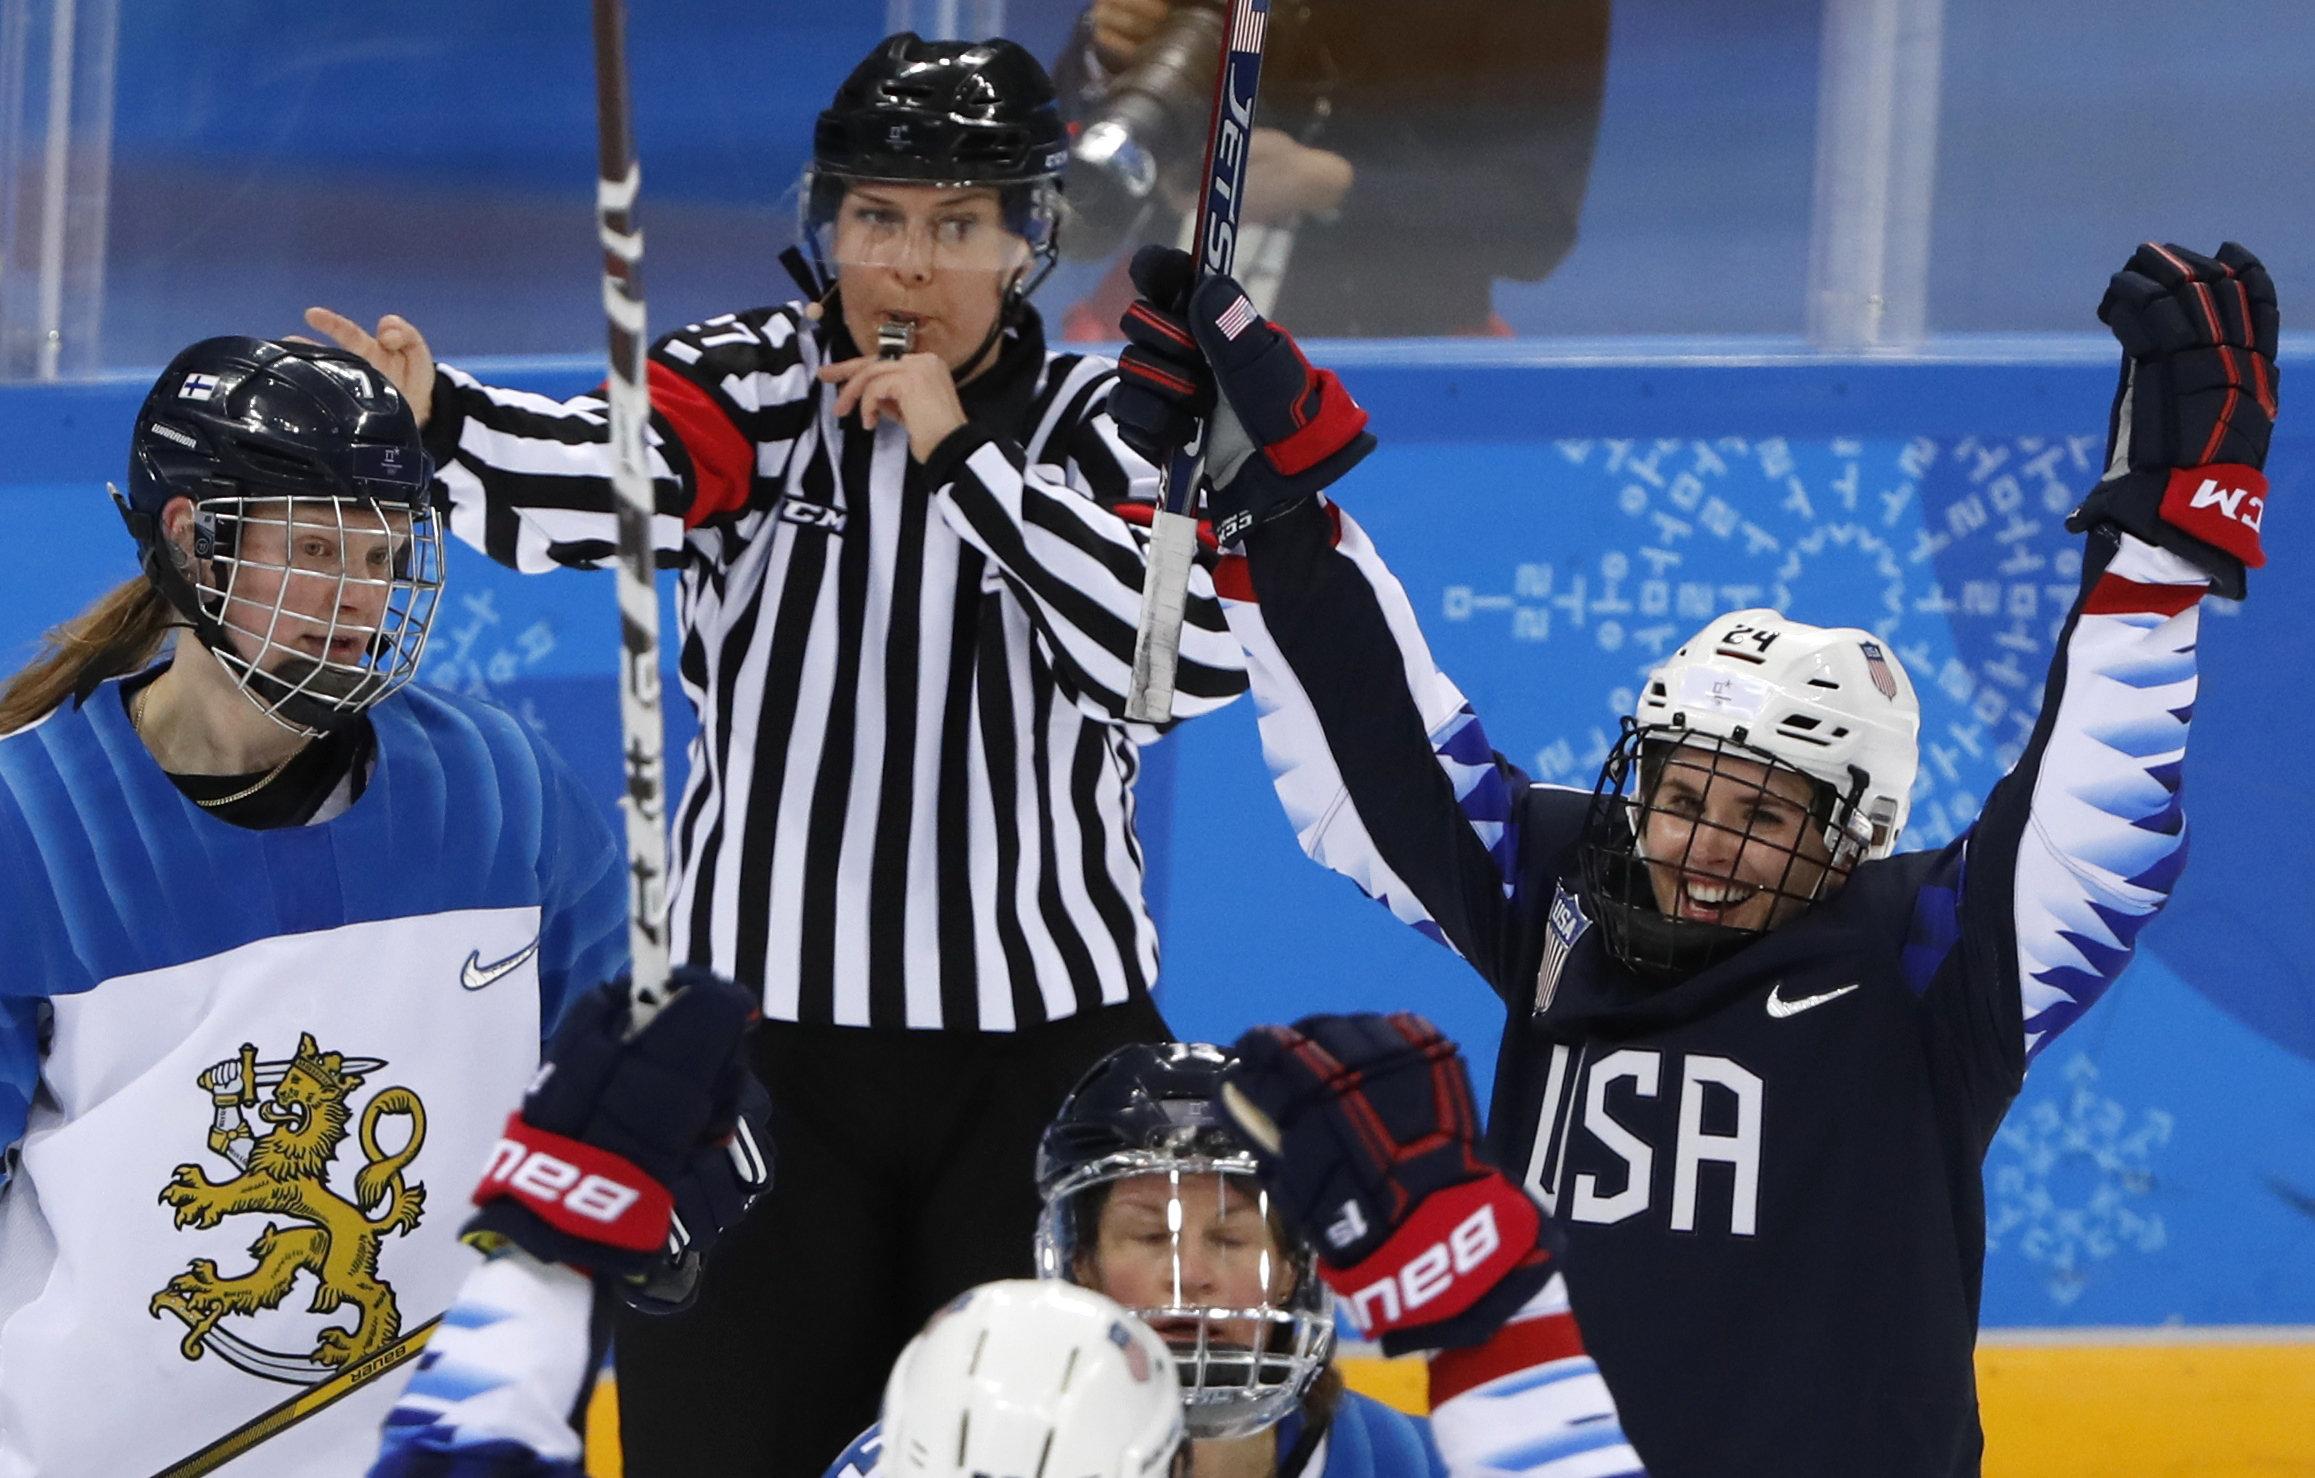 Ice Hockey - Pyeongchang 2018 Winter Olympics - Women's Semifinal Match - U.S. v Finland-  Gangneung Hockey Centre, Gangneung, South Korea - February 19, 2018 -  Dani Cameranesi of the U.S. celebrates scoring her goal. REUTERS/Grigory Dukor